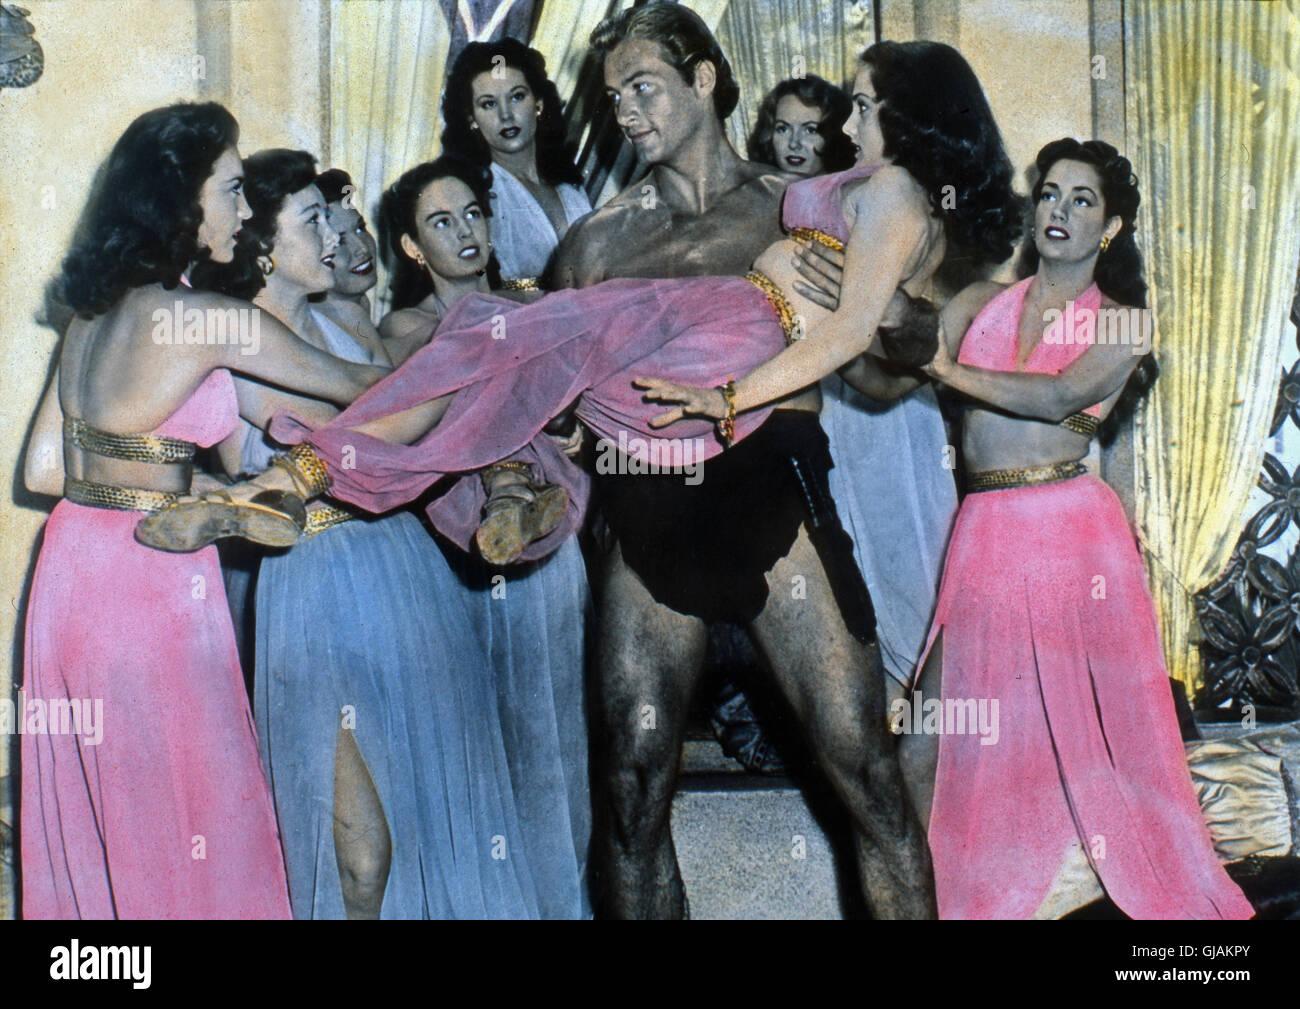 Tarzan And The Slave Girl, aka: Tarzan und das Sklavenmädchen, USA 1950, Regie: Lee Sholem, Darsteller: Lex - Stock Image